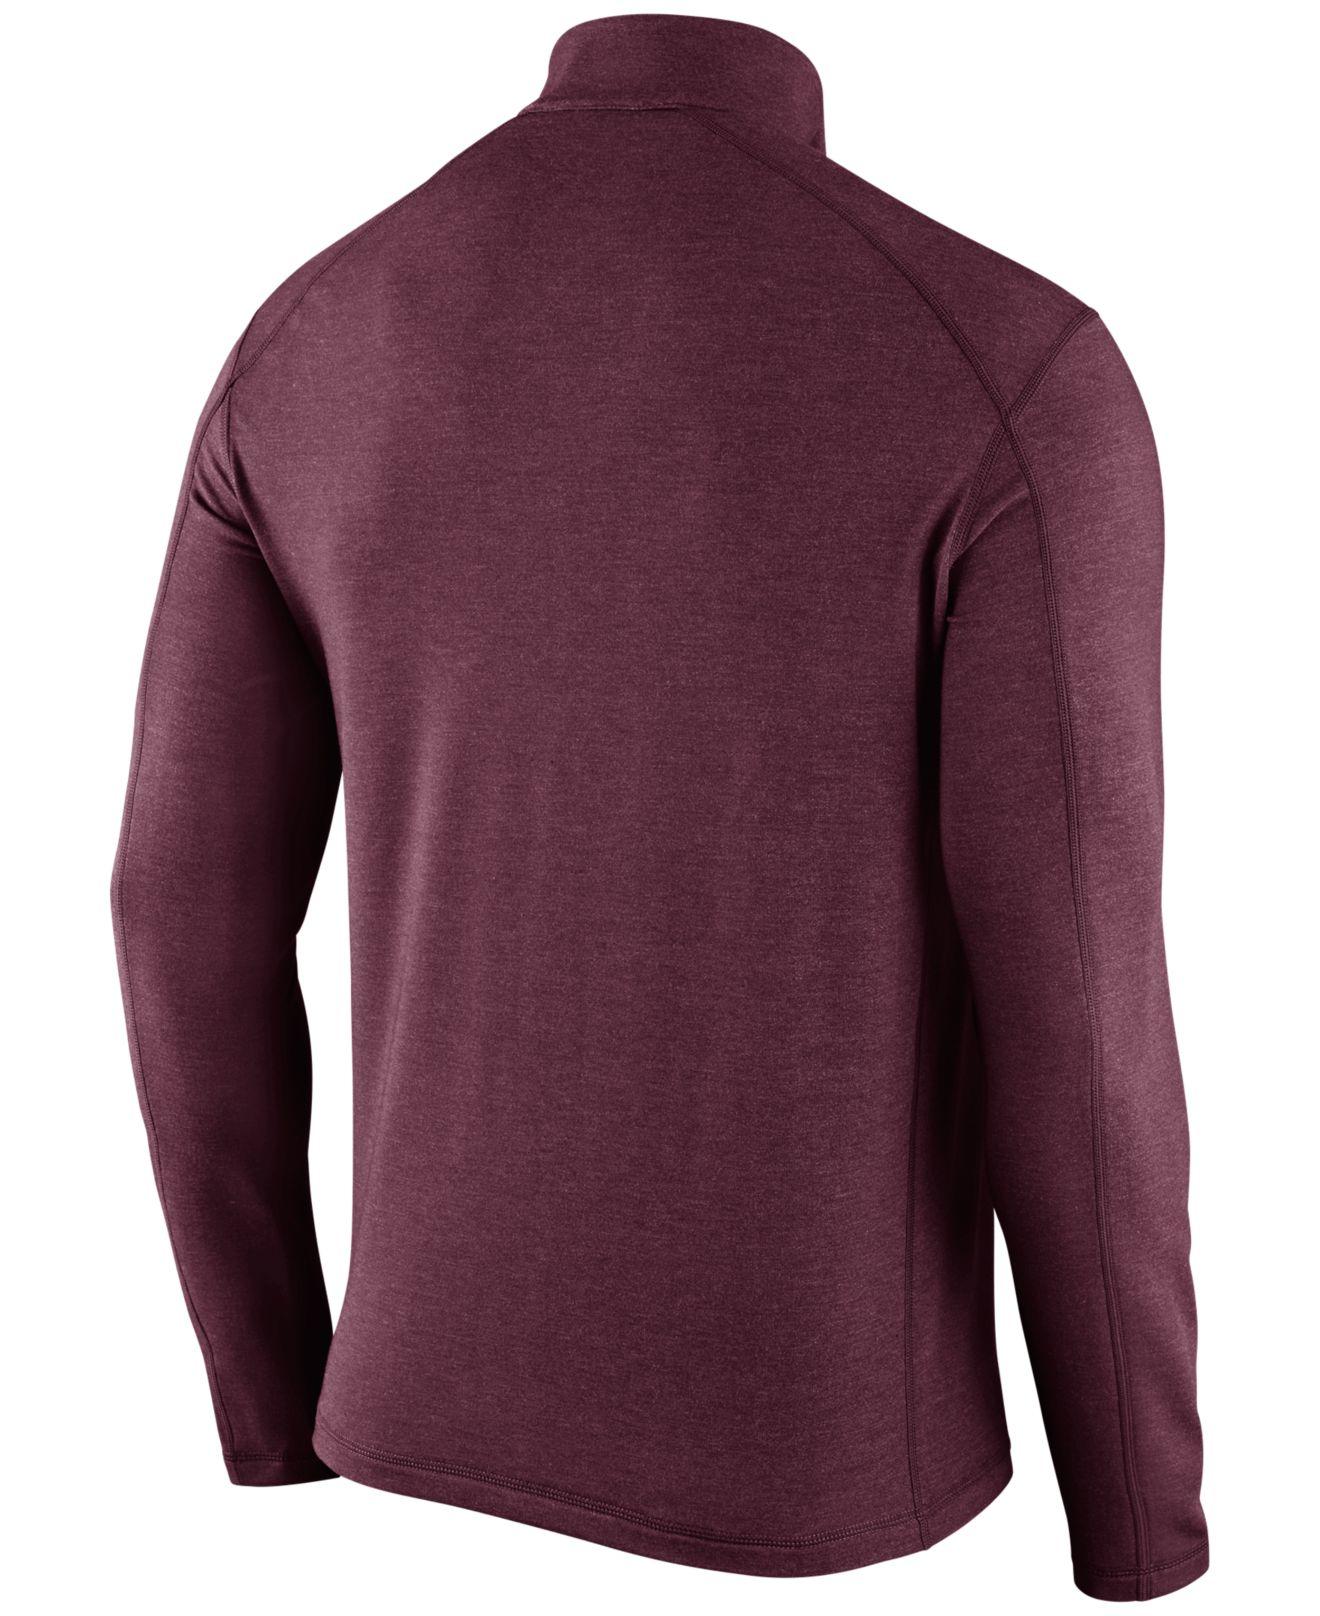 nike men 39 s minnesota golden gophers game day quarter zip pullover in purple for men lyst. Black Bedroom Furniture Sets. Home Design Ideas